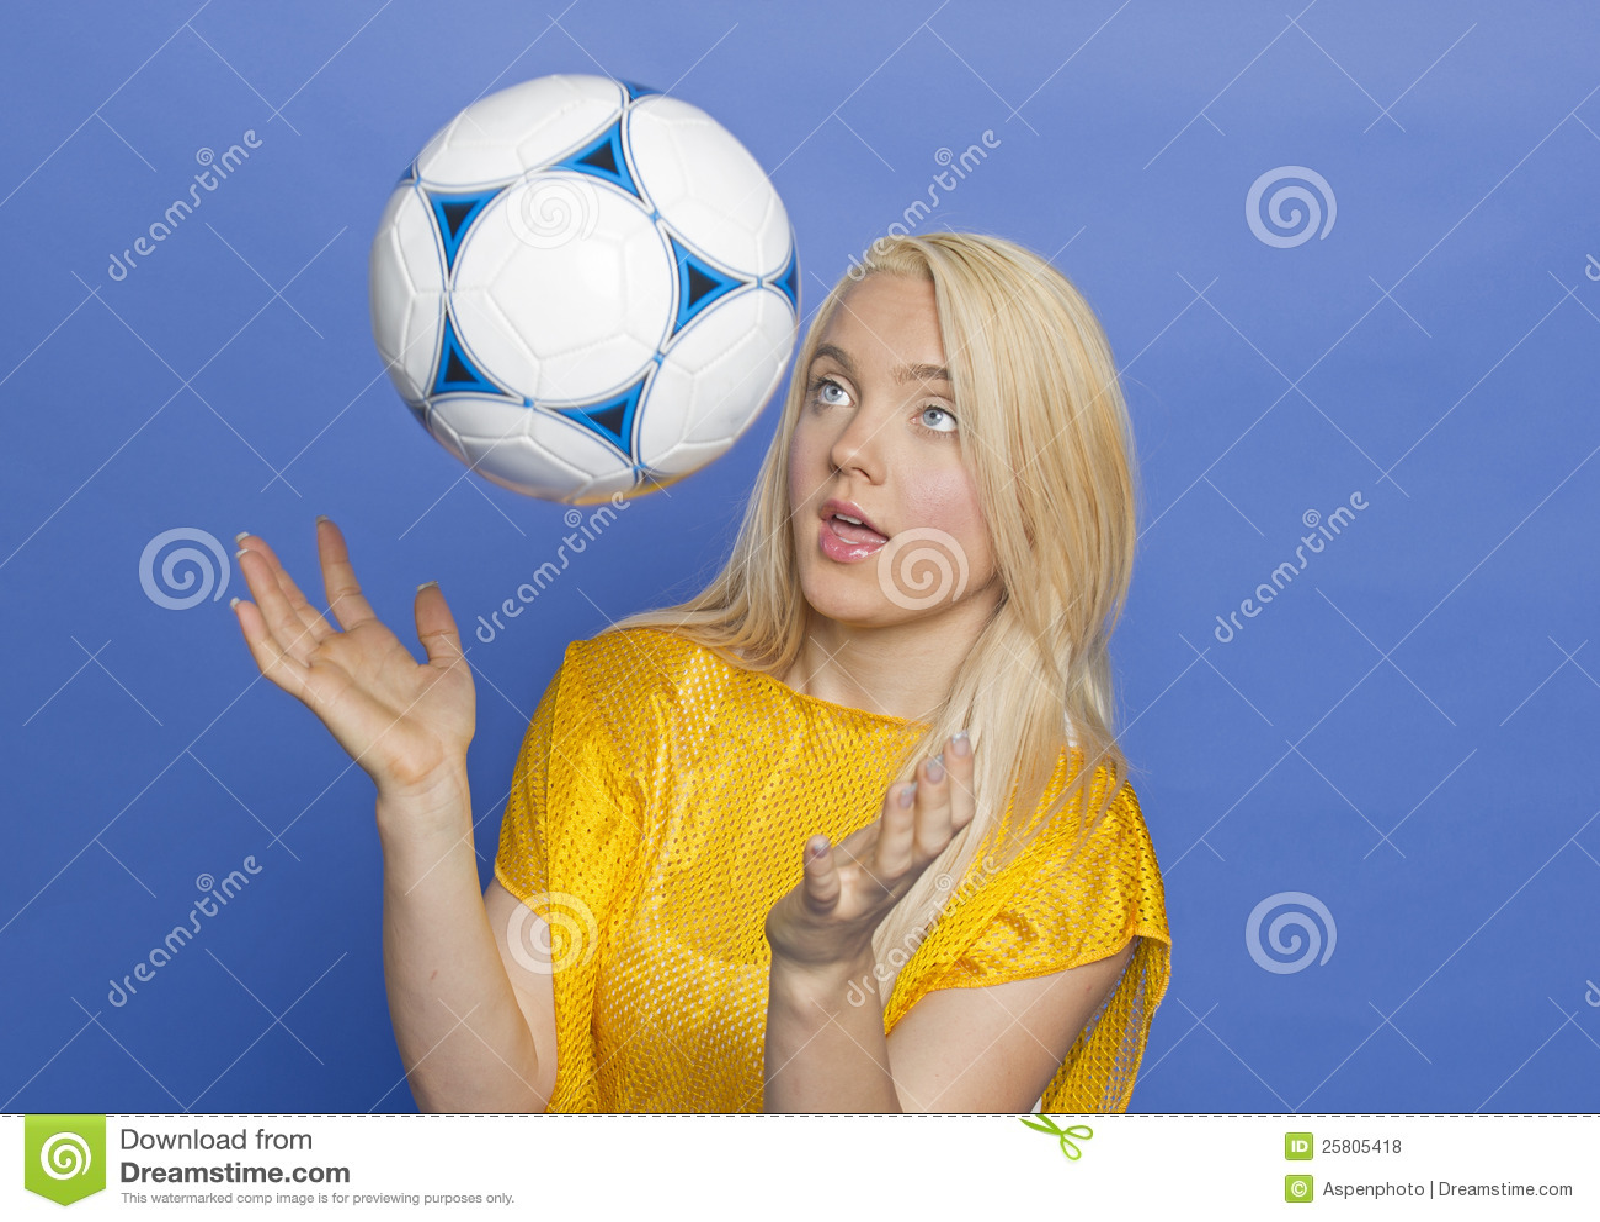 Blonde Soccer 31